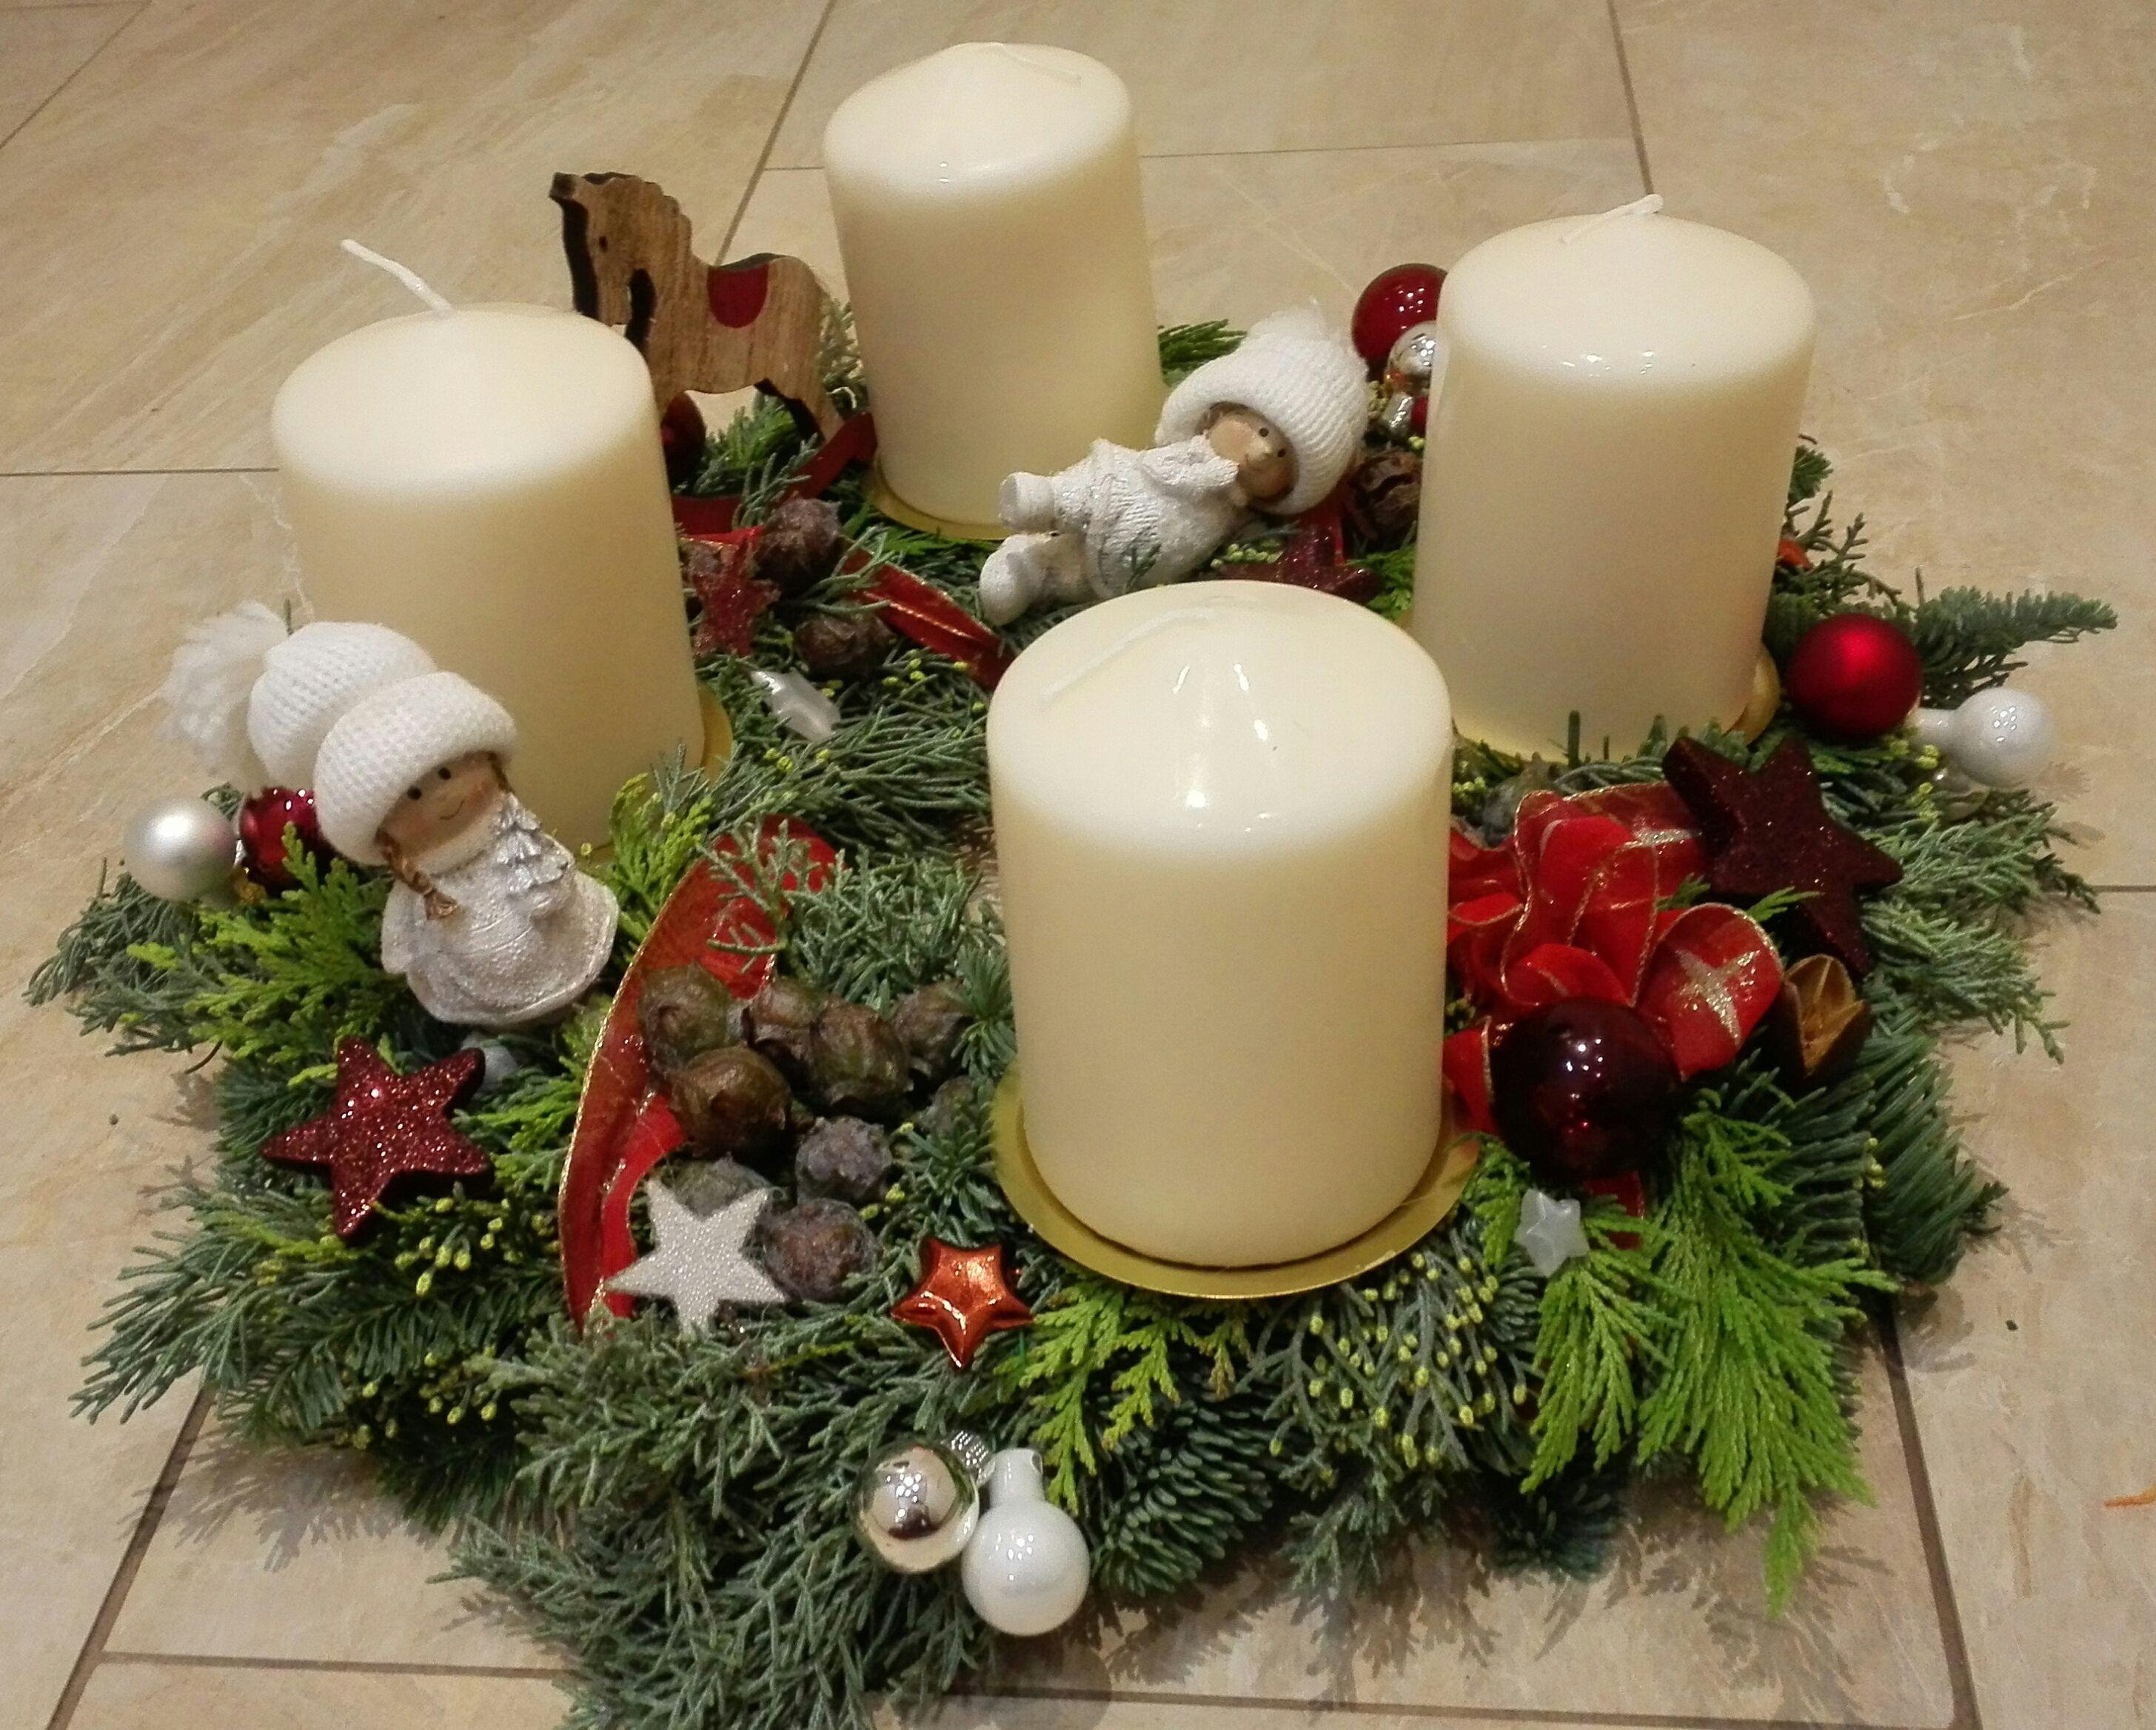 adventskranz weihnachtskranz advent deko m dchen rot wei x mas wei e kerzen x mas deko. Black Bedroom Furniture Sets. Home Design Ideas